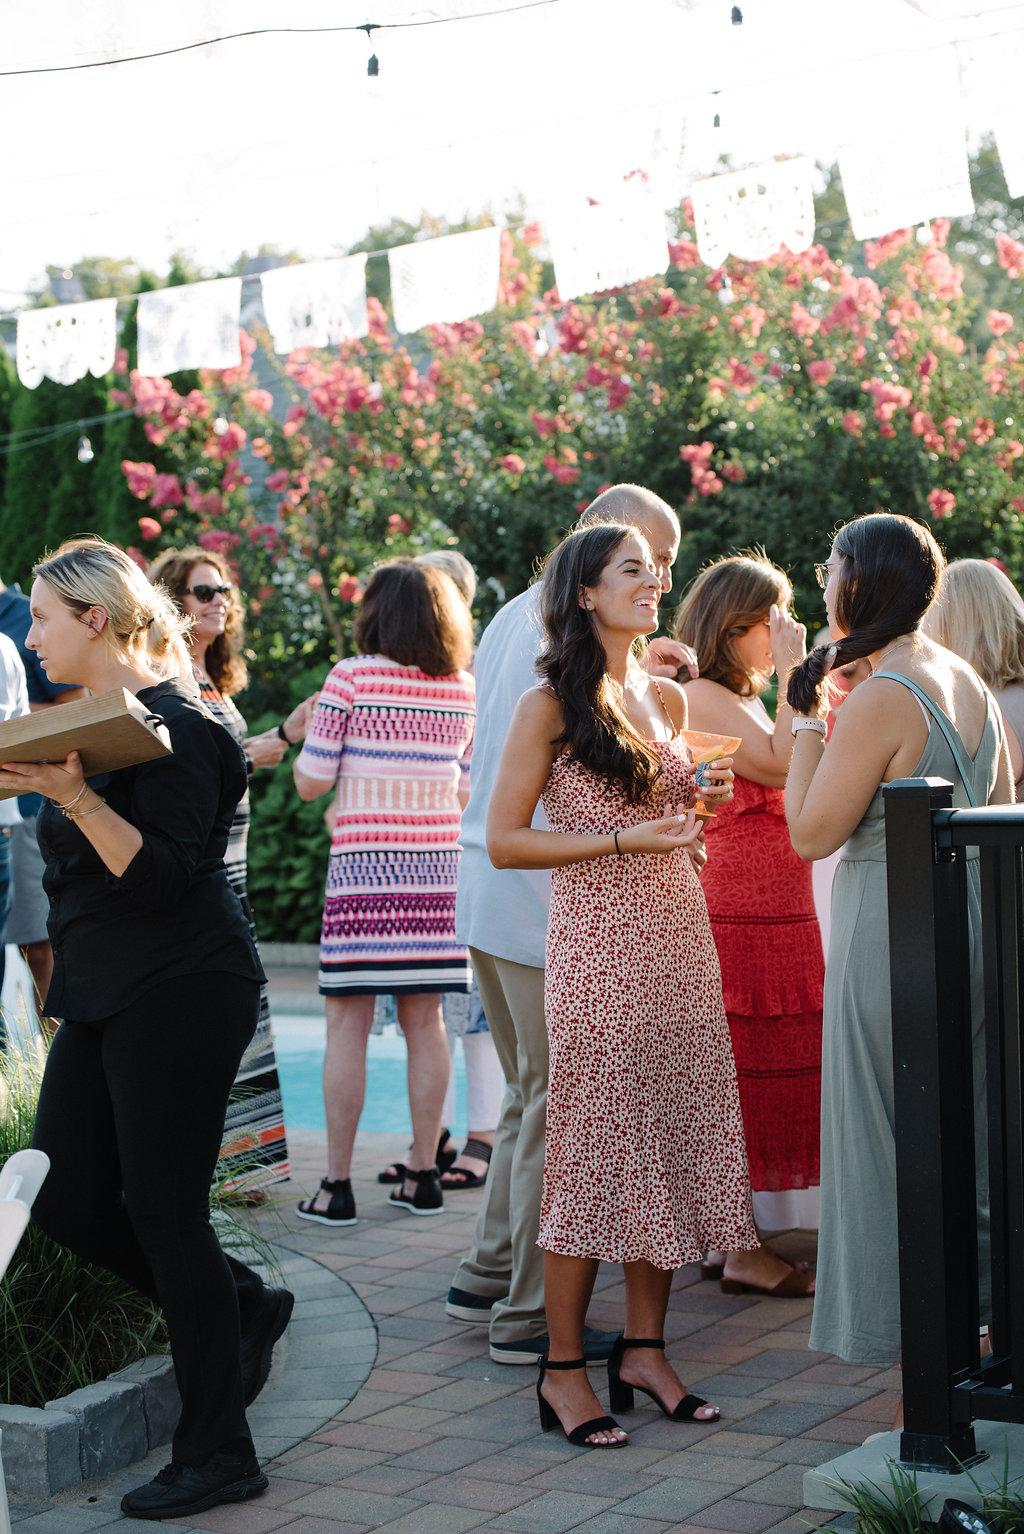 FiestaThemedEngagementParty-Nicole+Mike-SeaGirt-NewJersey-OliviaChristinaPhoto-71.jpg